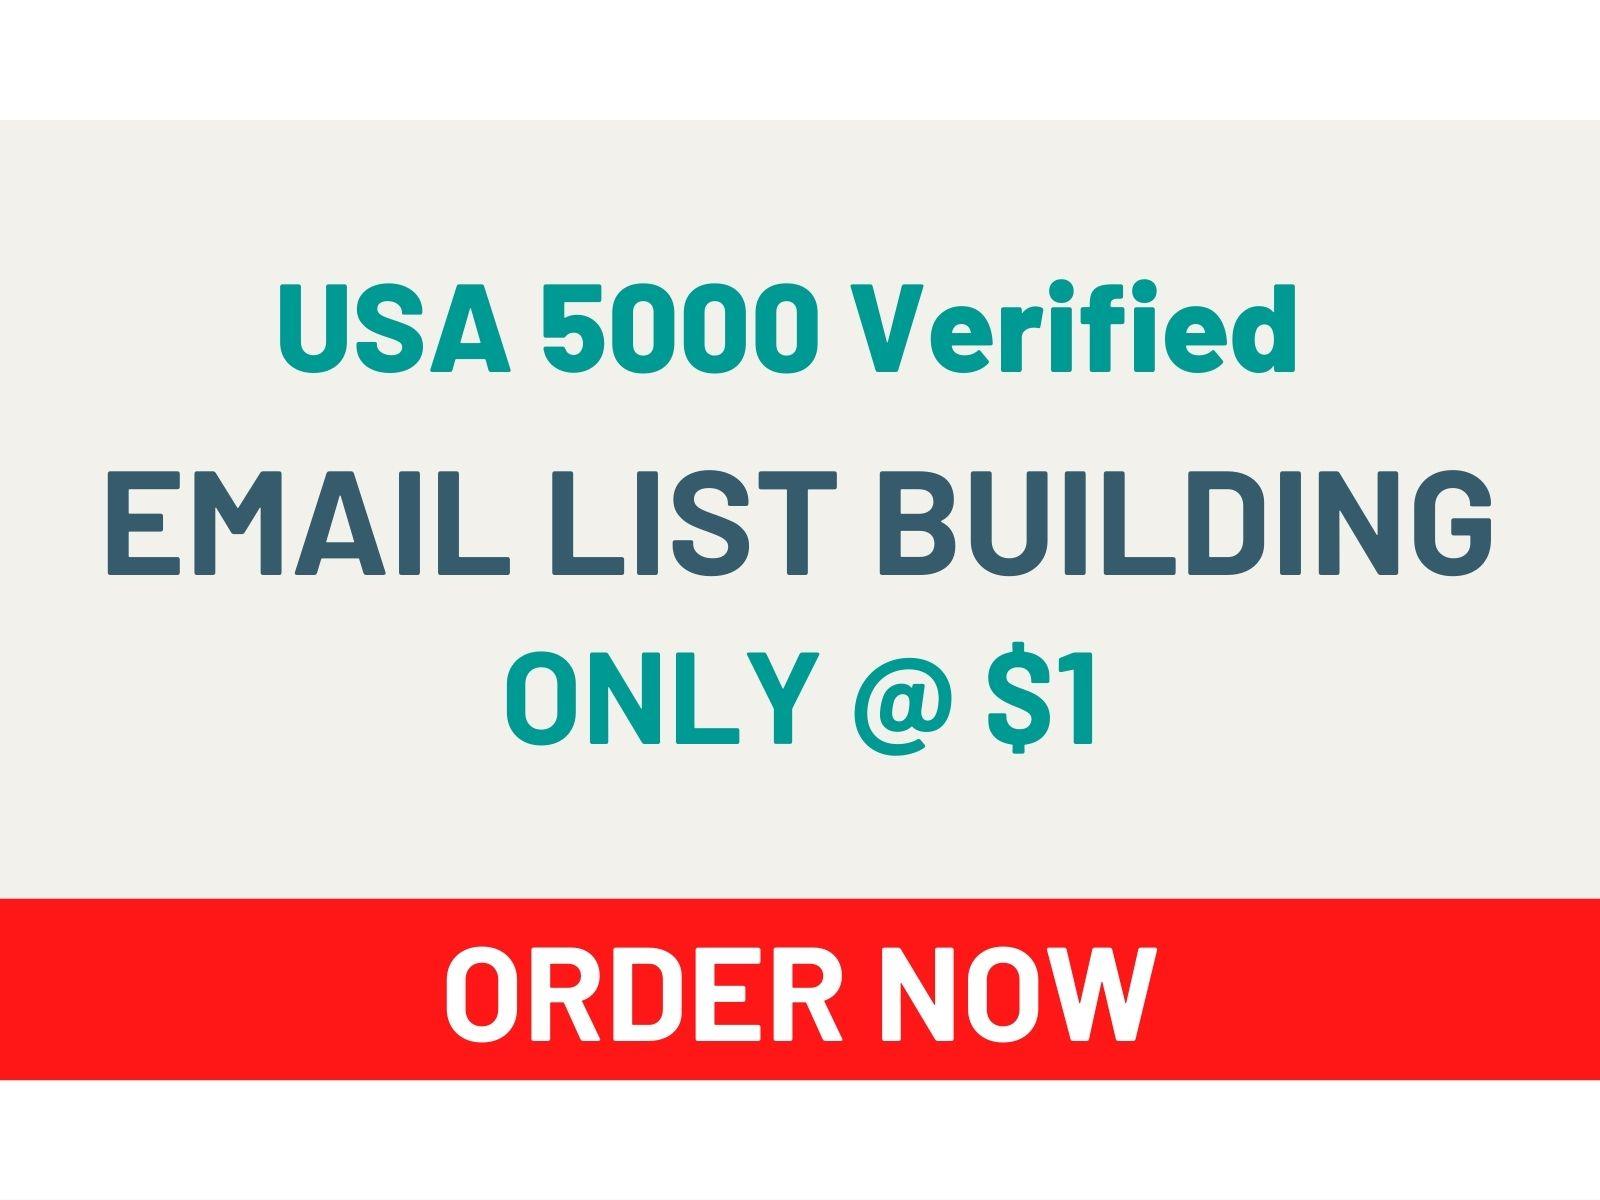 I Will Give You USA 5000 Verified Email List